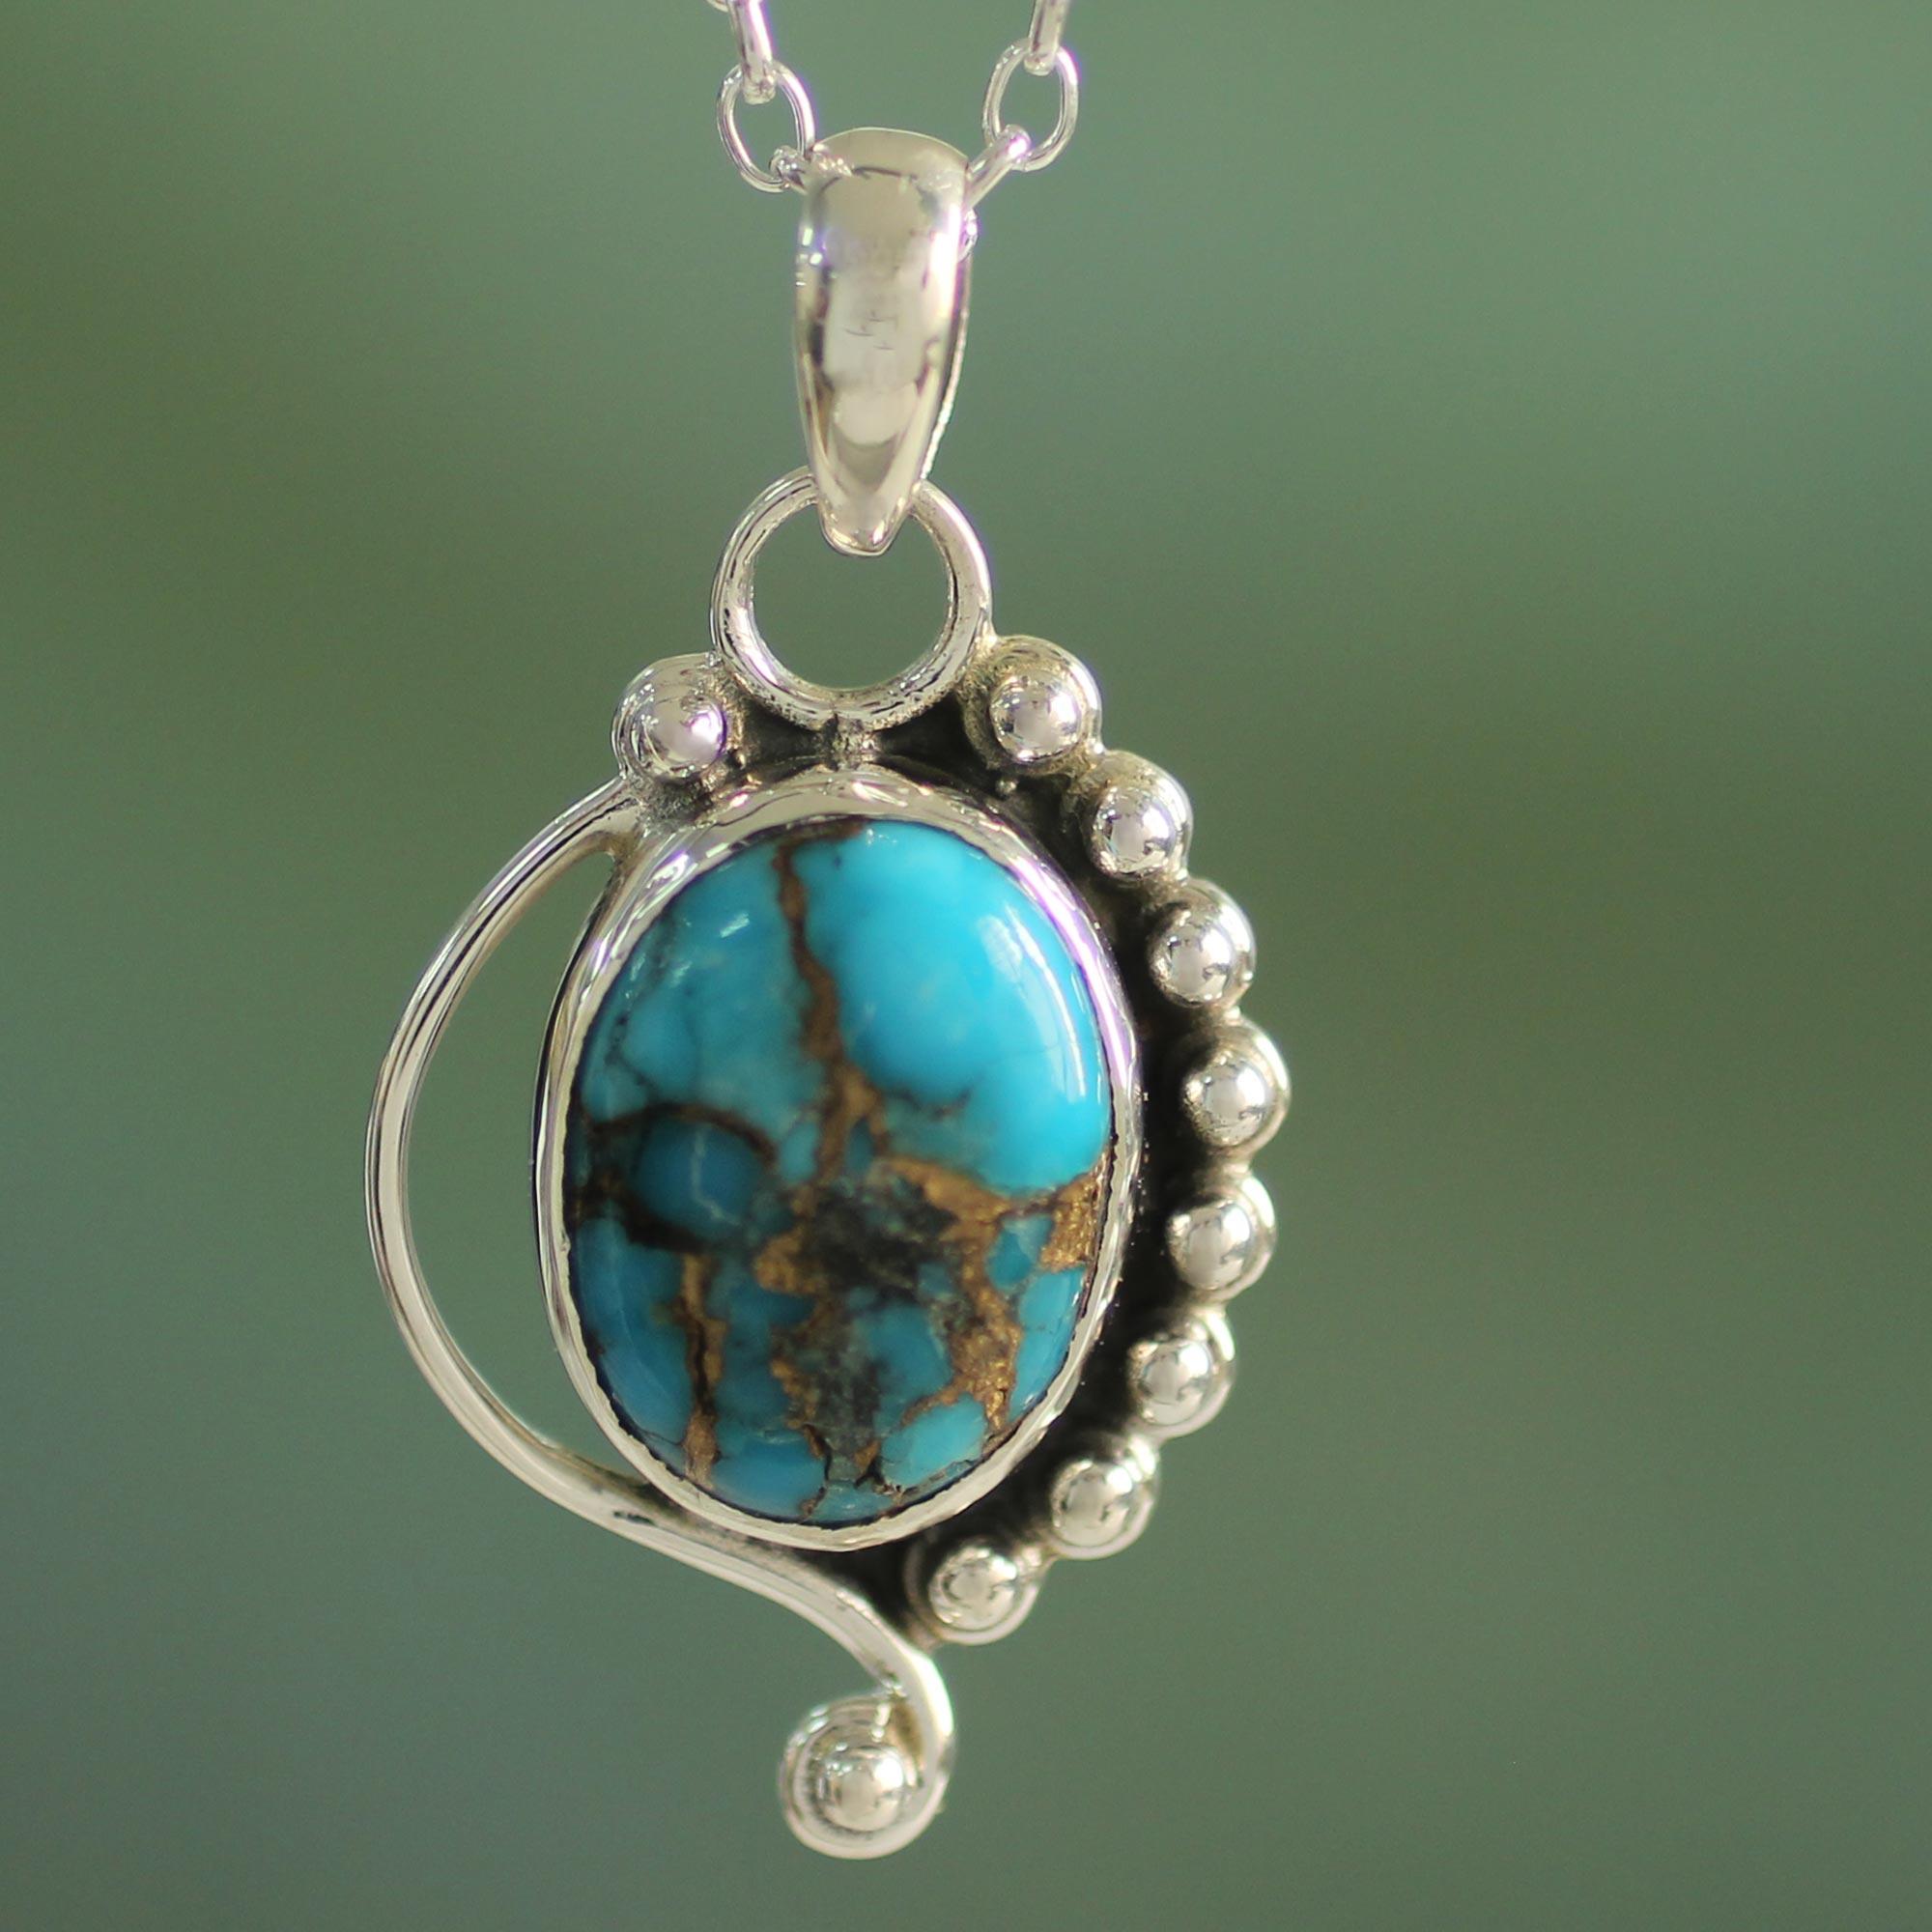 Blue Turquoise Pendant Necklace